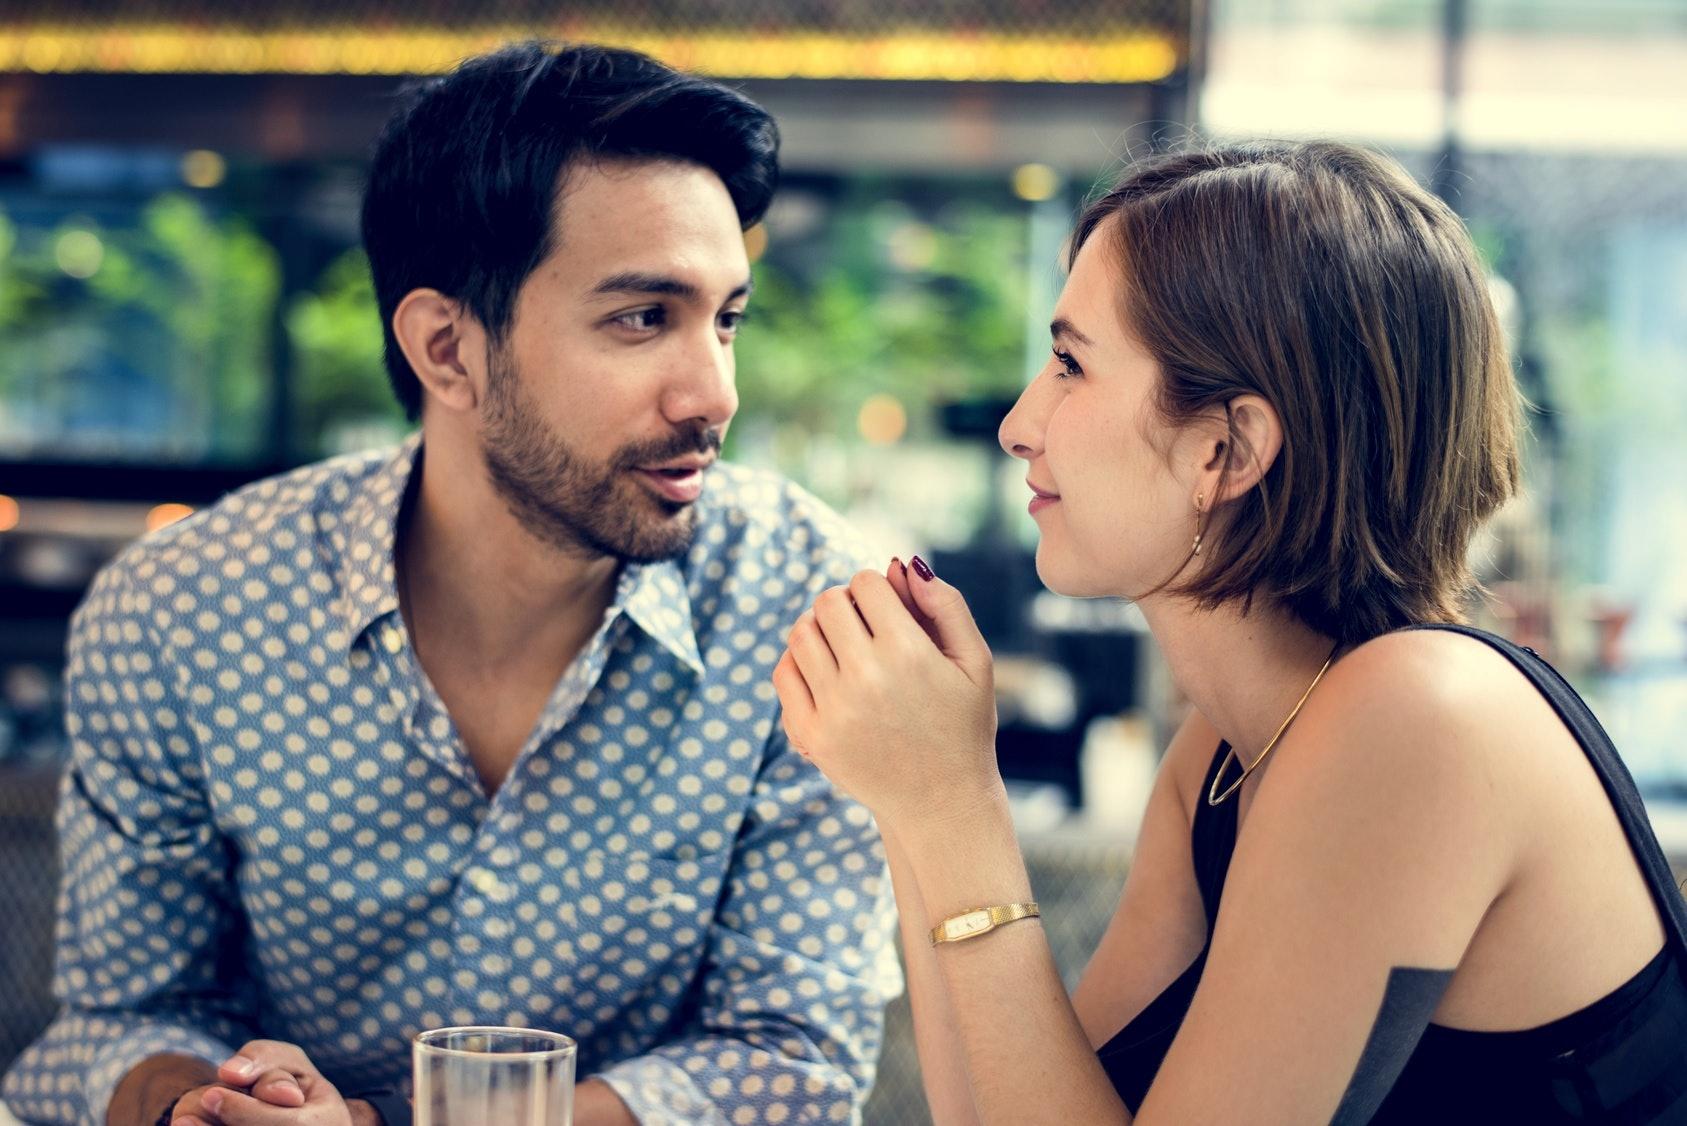 Dream dating a blind man